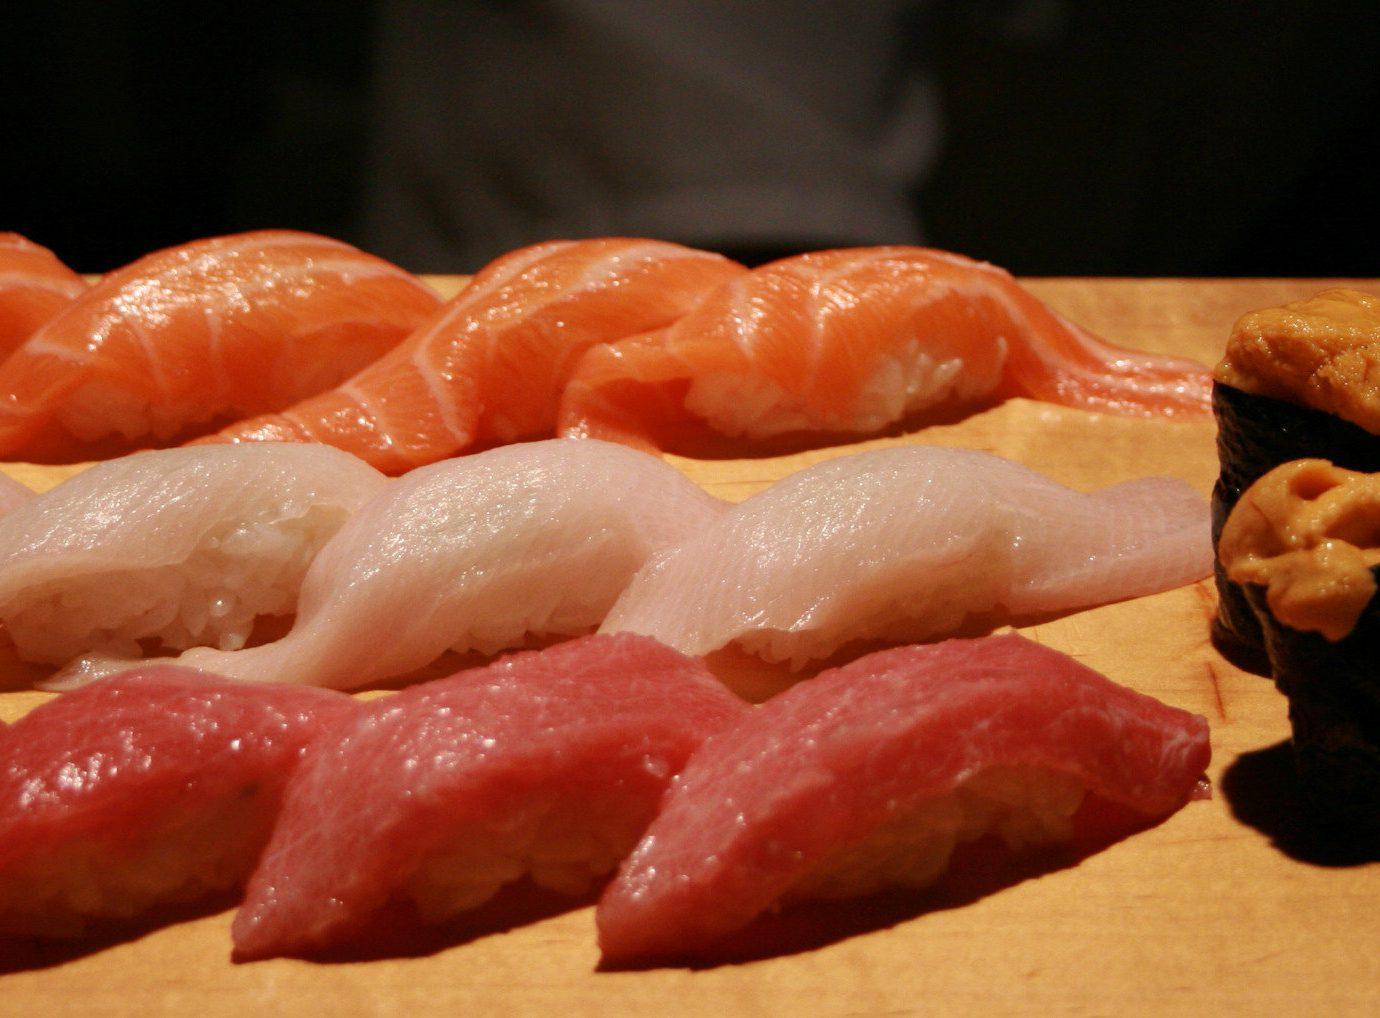 Travel Tips food indoor cuisine dish sushi japanese cuisine asian food sashimi kobe beef meat animal source foods comfort food